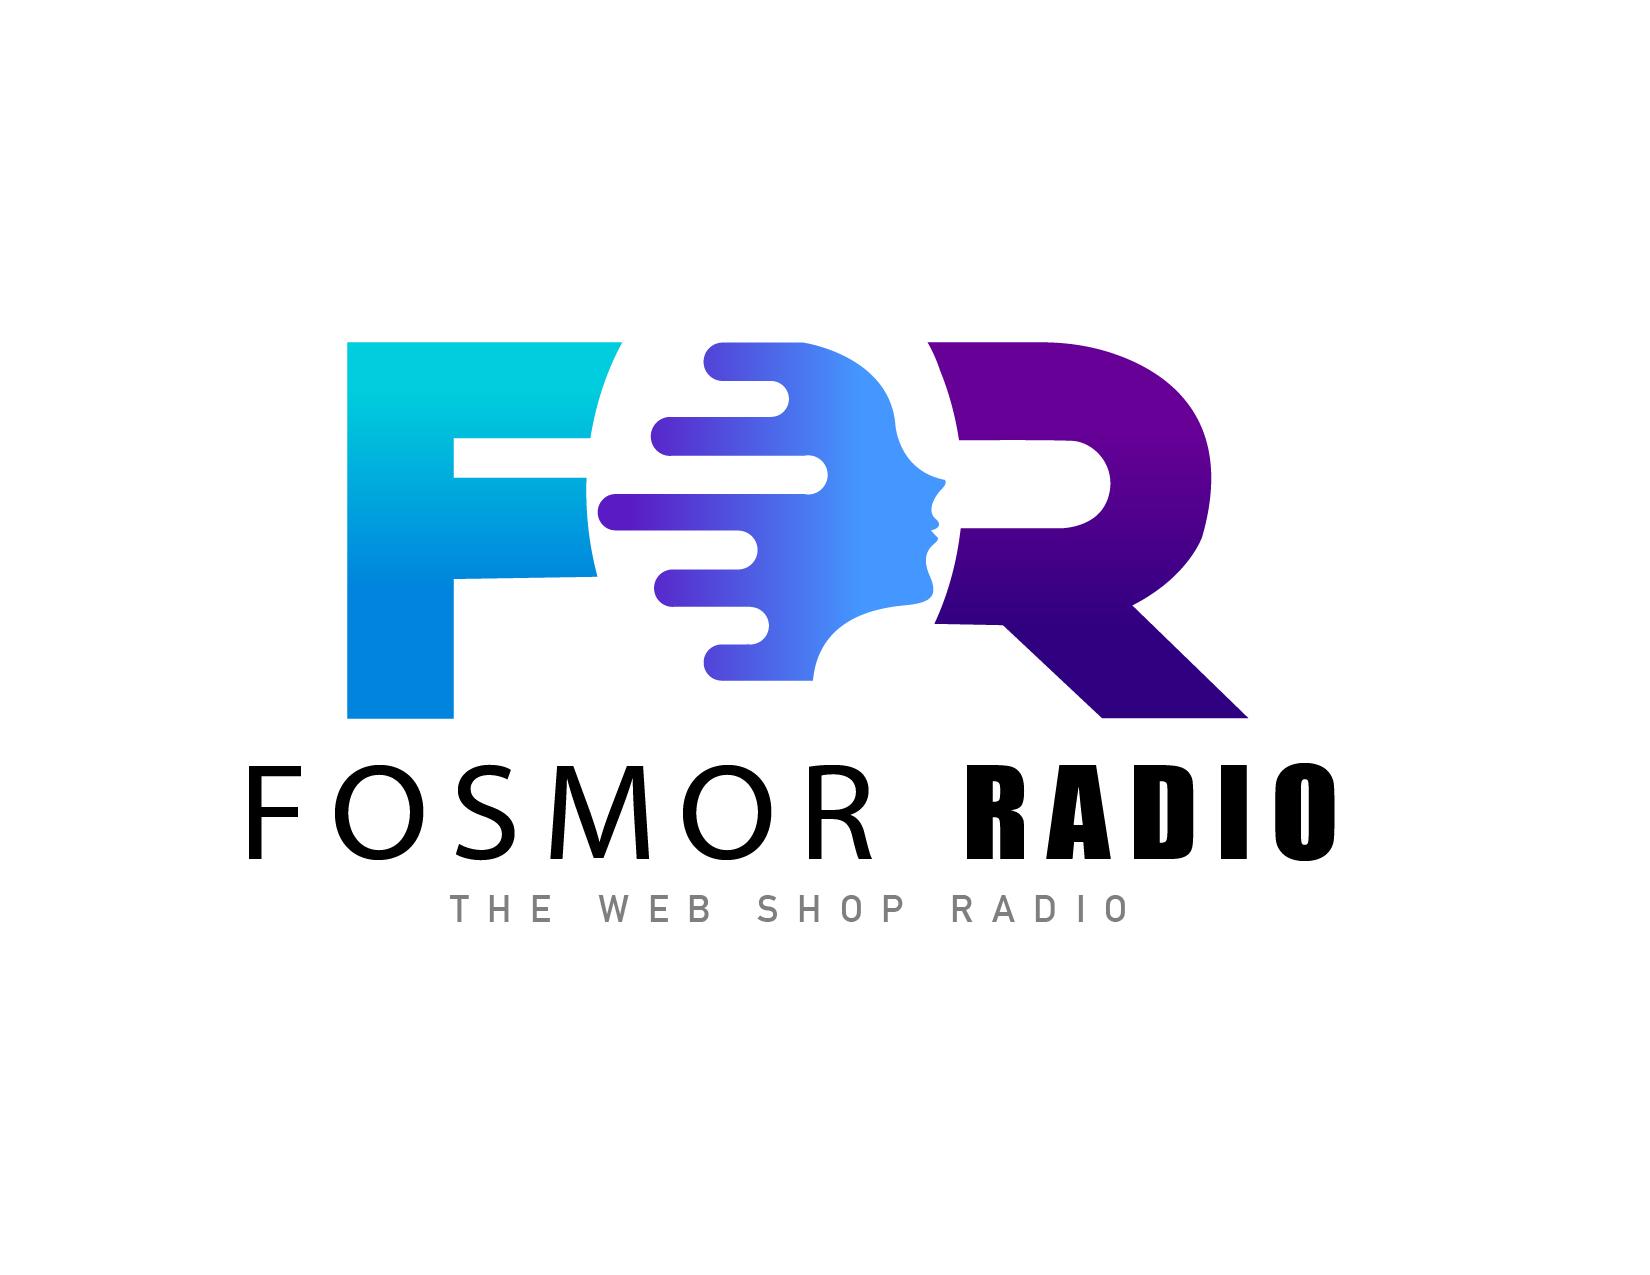 The Web Shop Radio